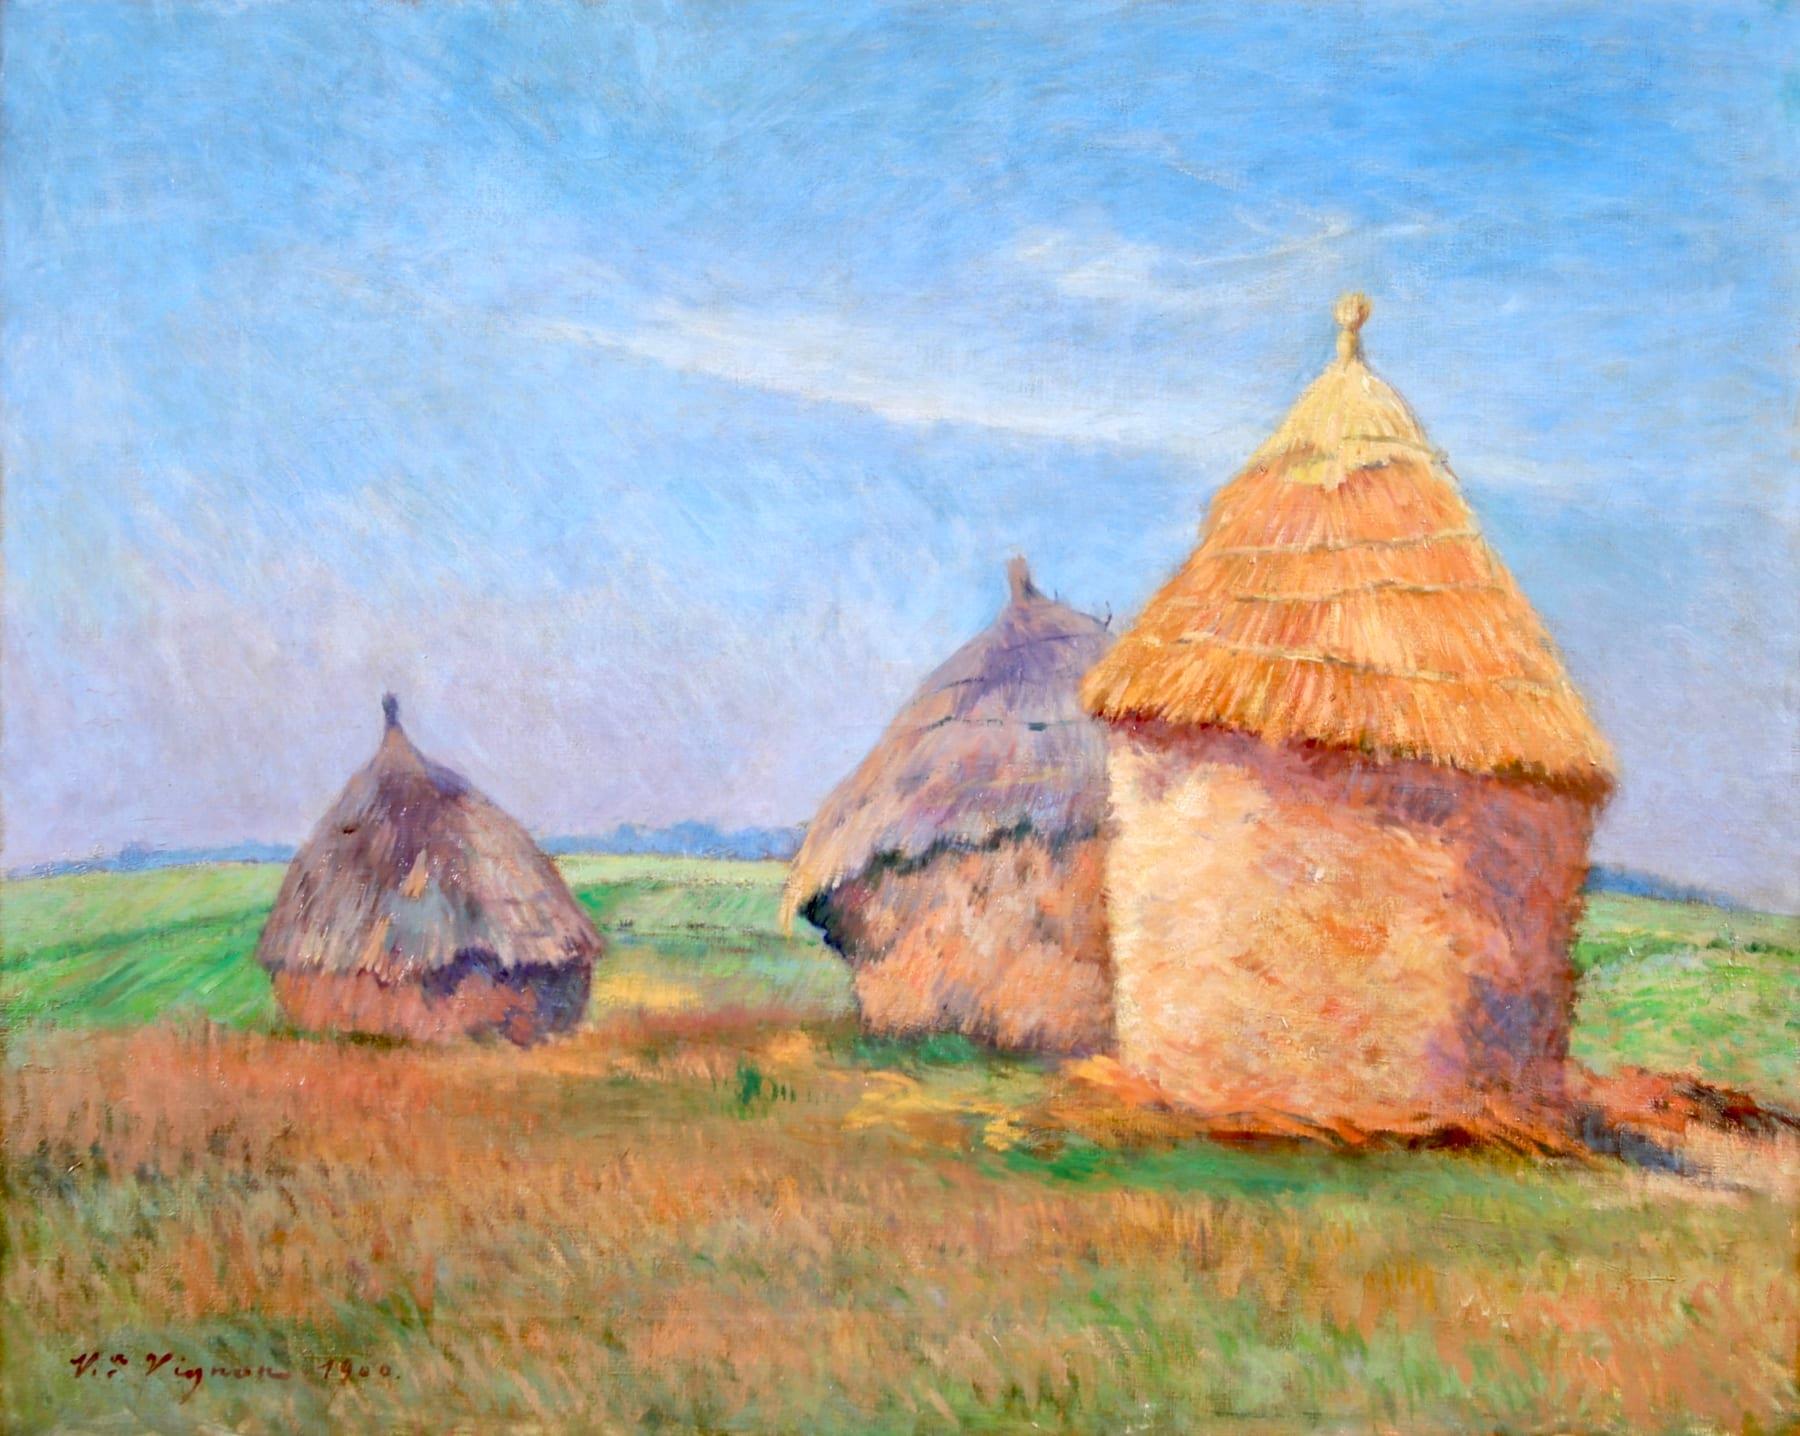 Les Meules - Impressionist Oil, Haystacks in Summer Landscape by Victor Vignon